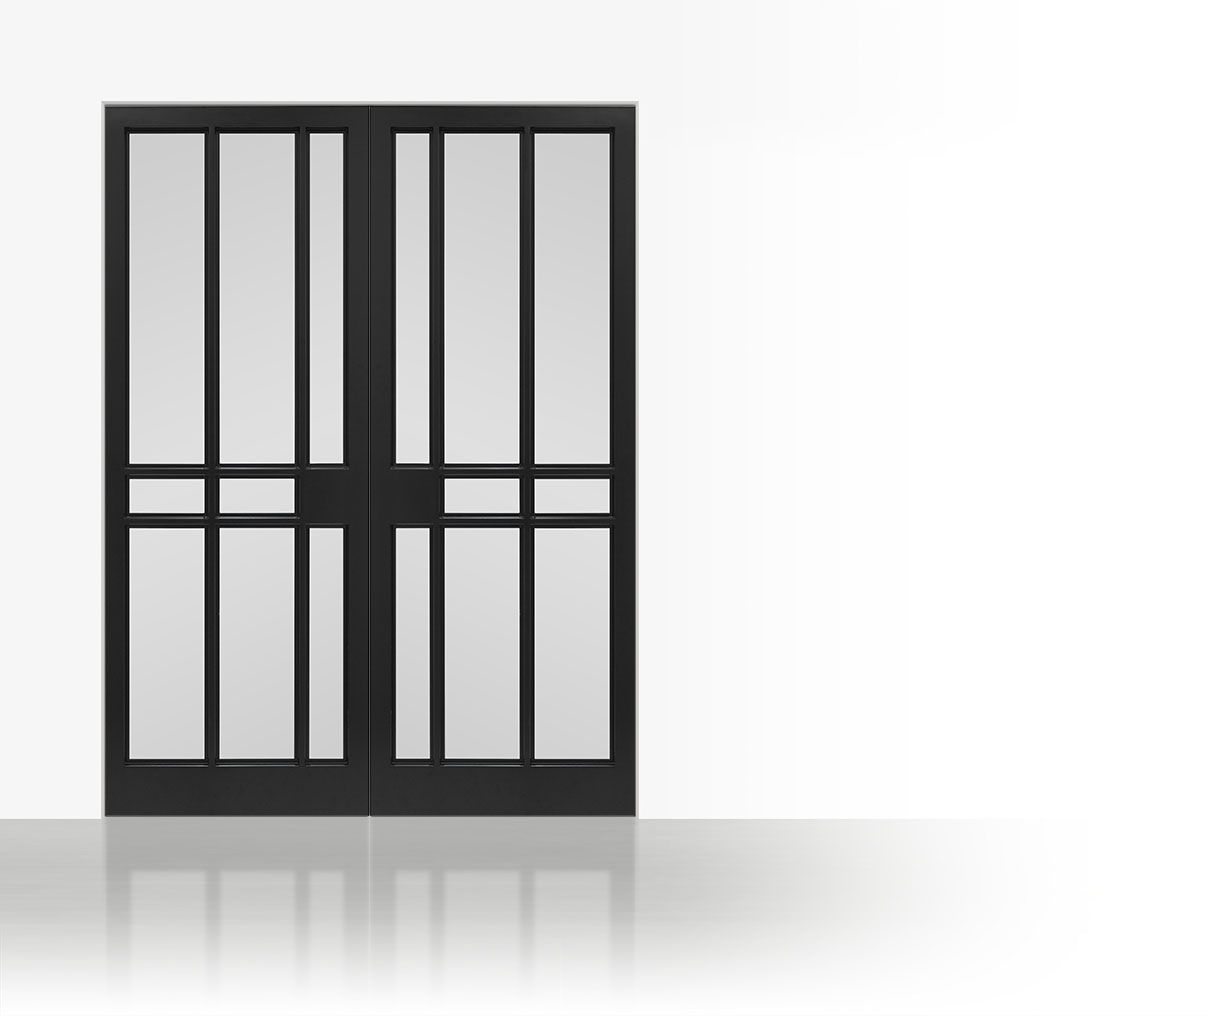 Le cadre ii dubbel deurs by marcel wolterinck boduor doors